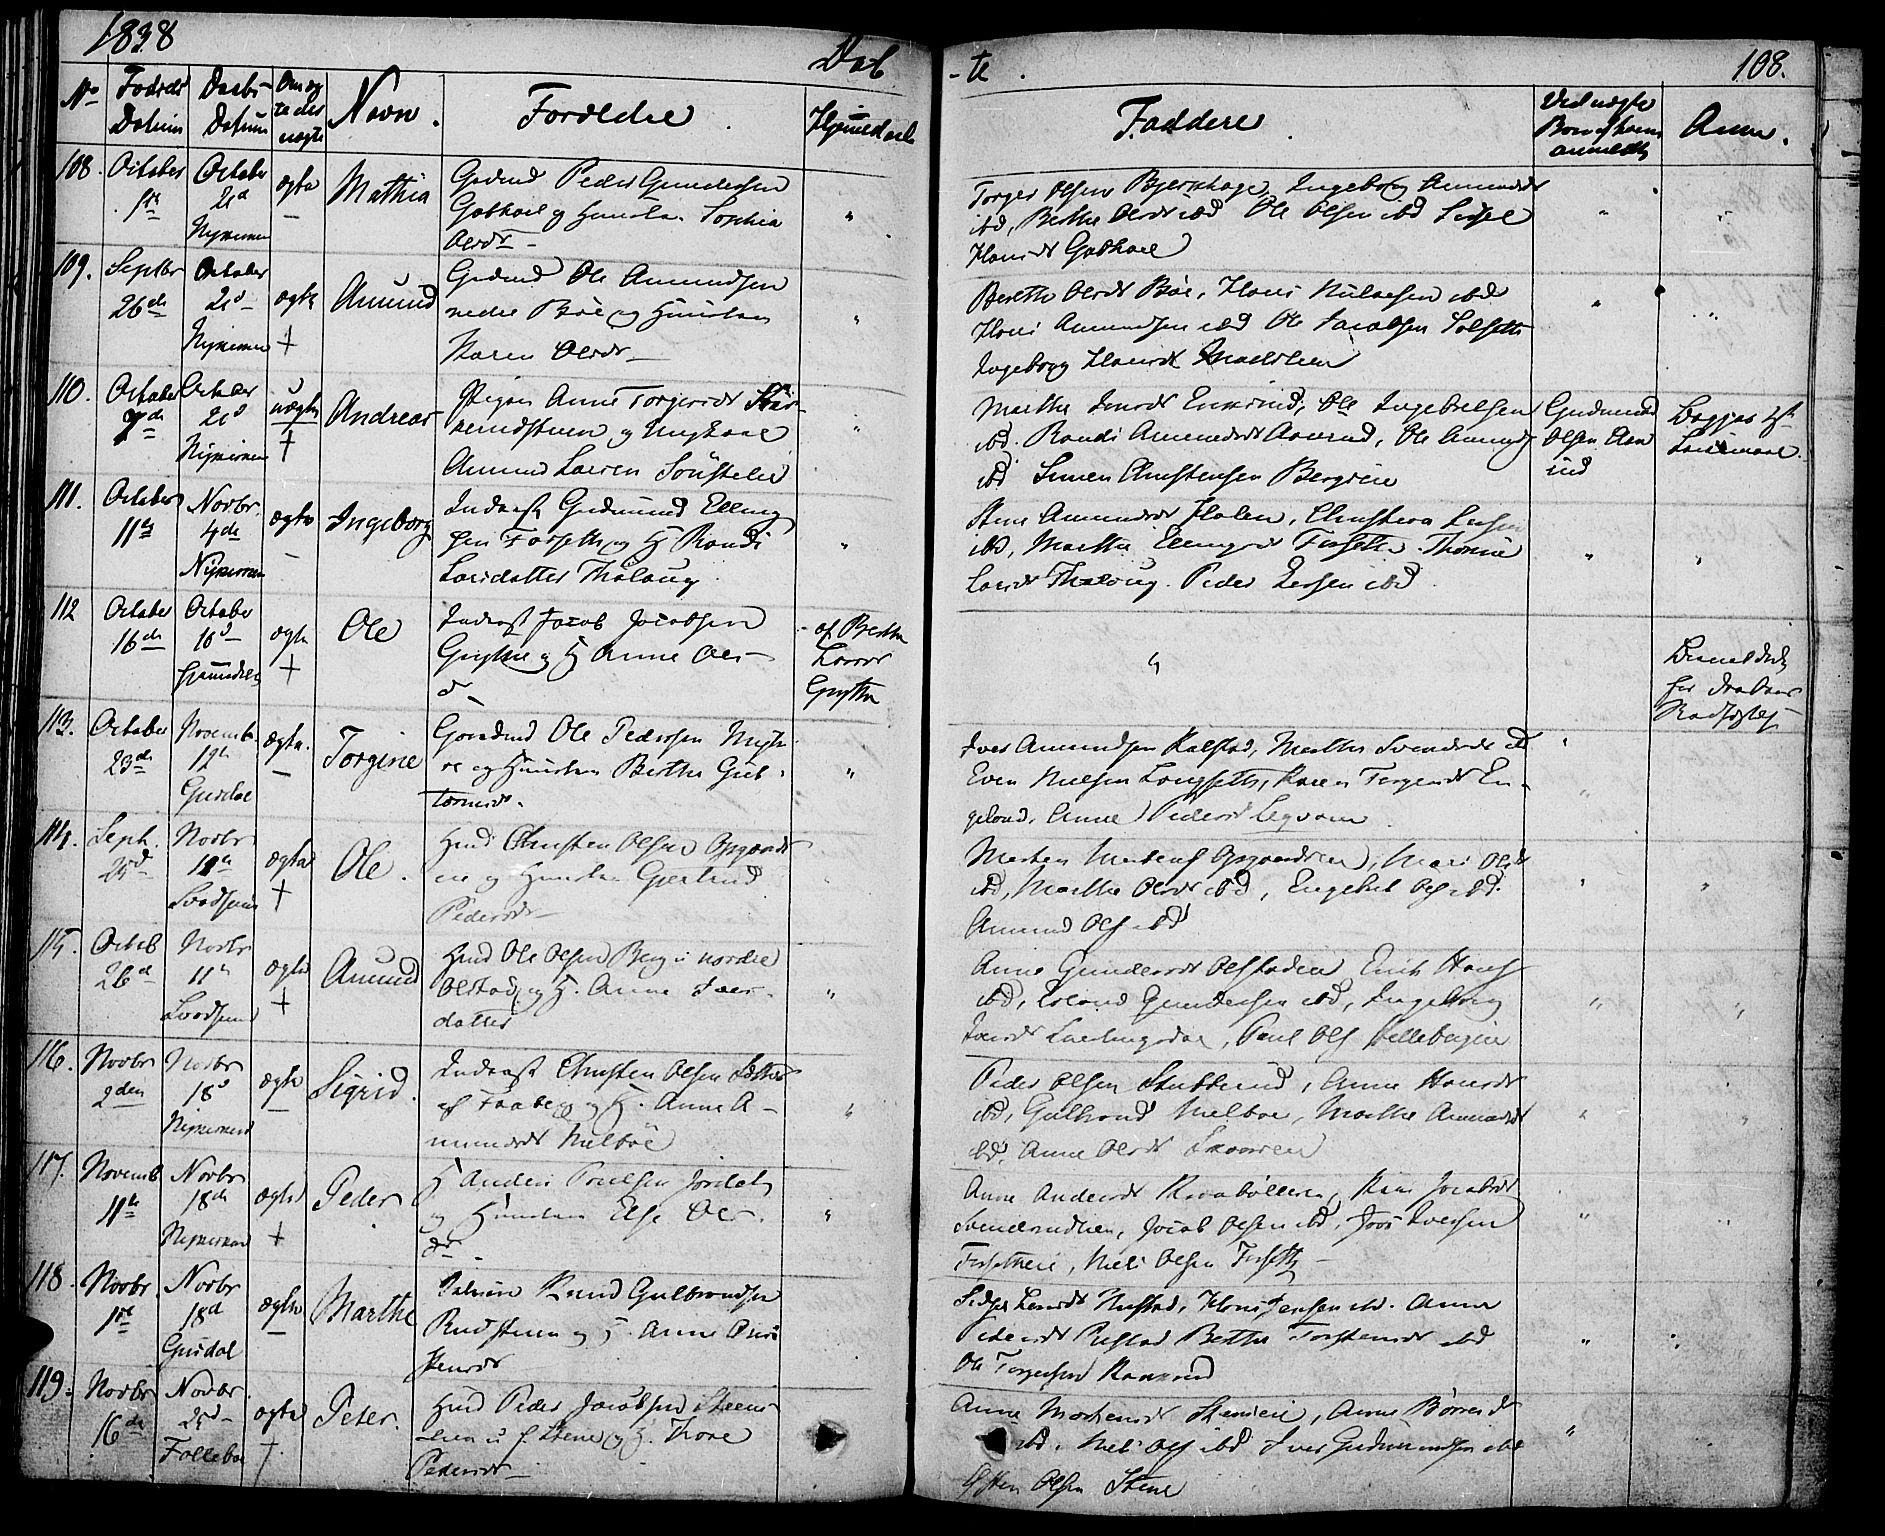 SAH, Gausdal prestekontor, Ministerialbok nr. 6, 1830-1839, s. 108